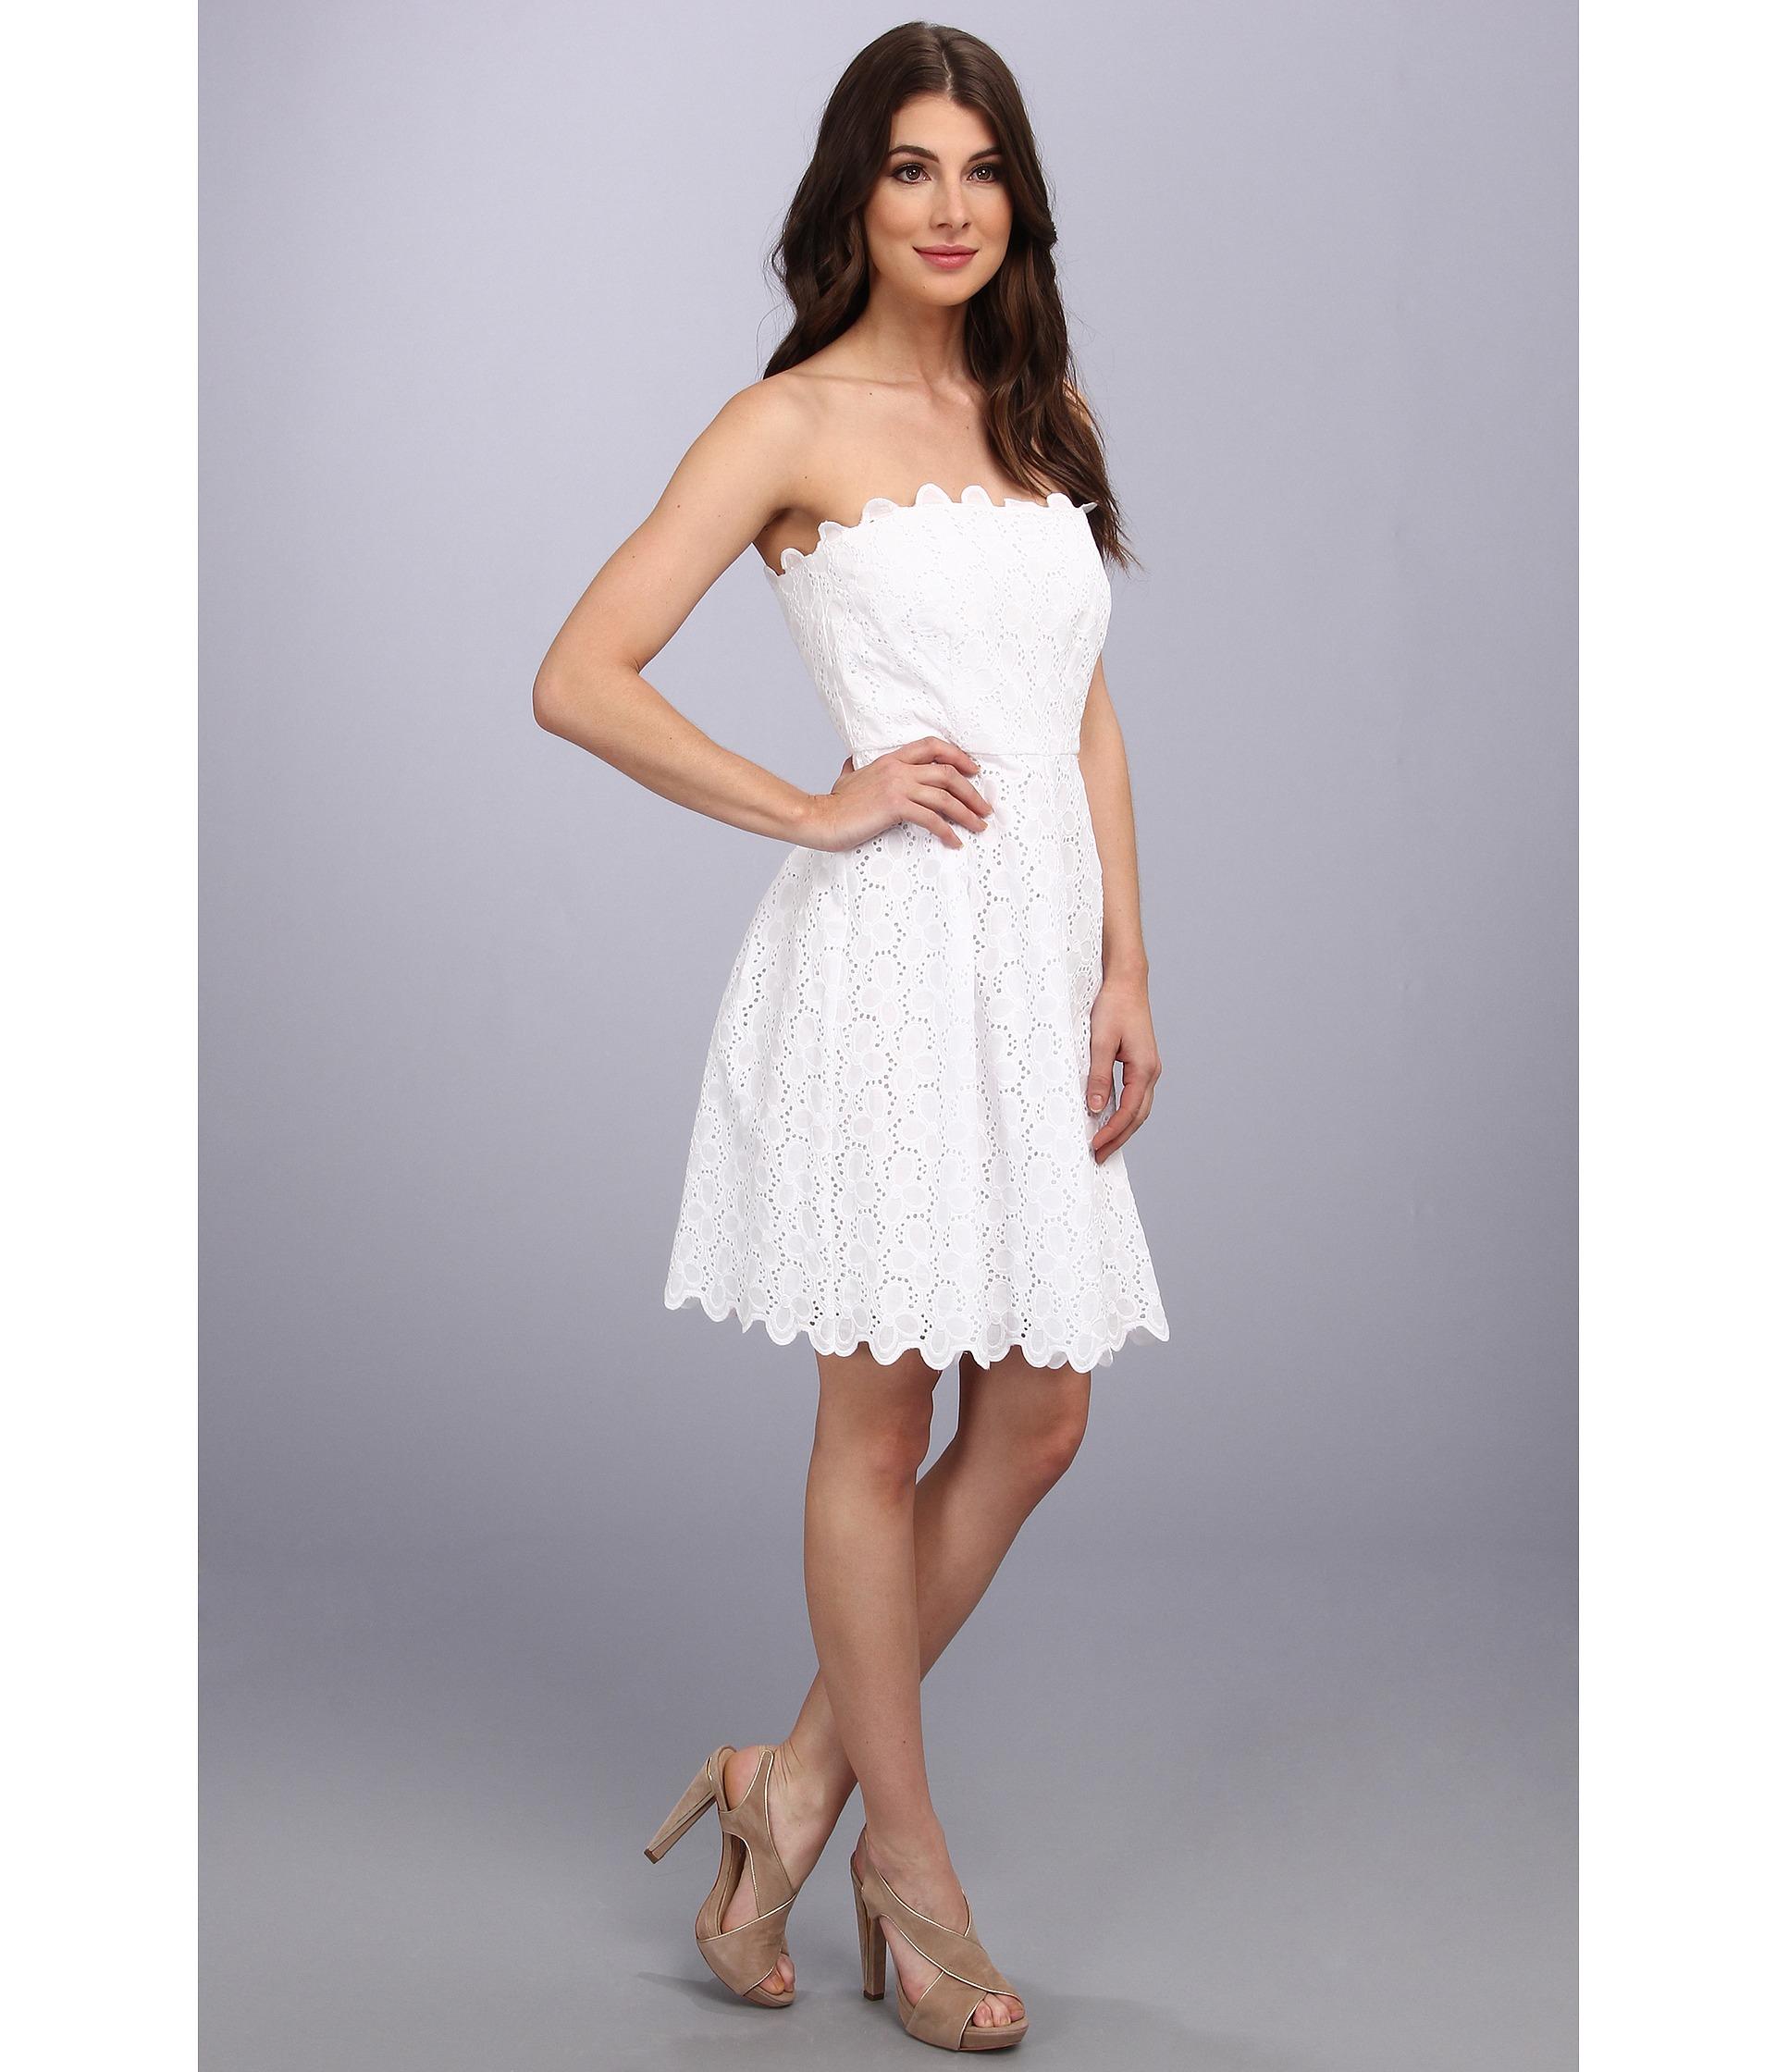 Laundry by shelli segal Strapless Eyelet Dress Graduation in White ...